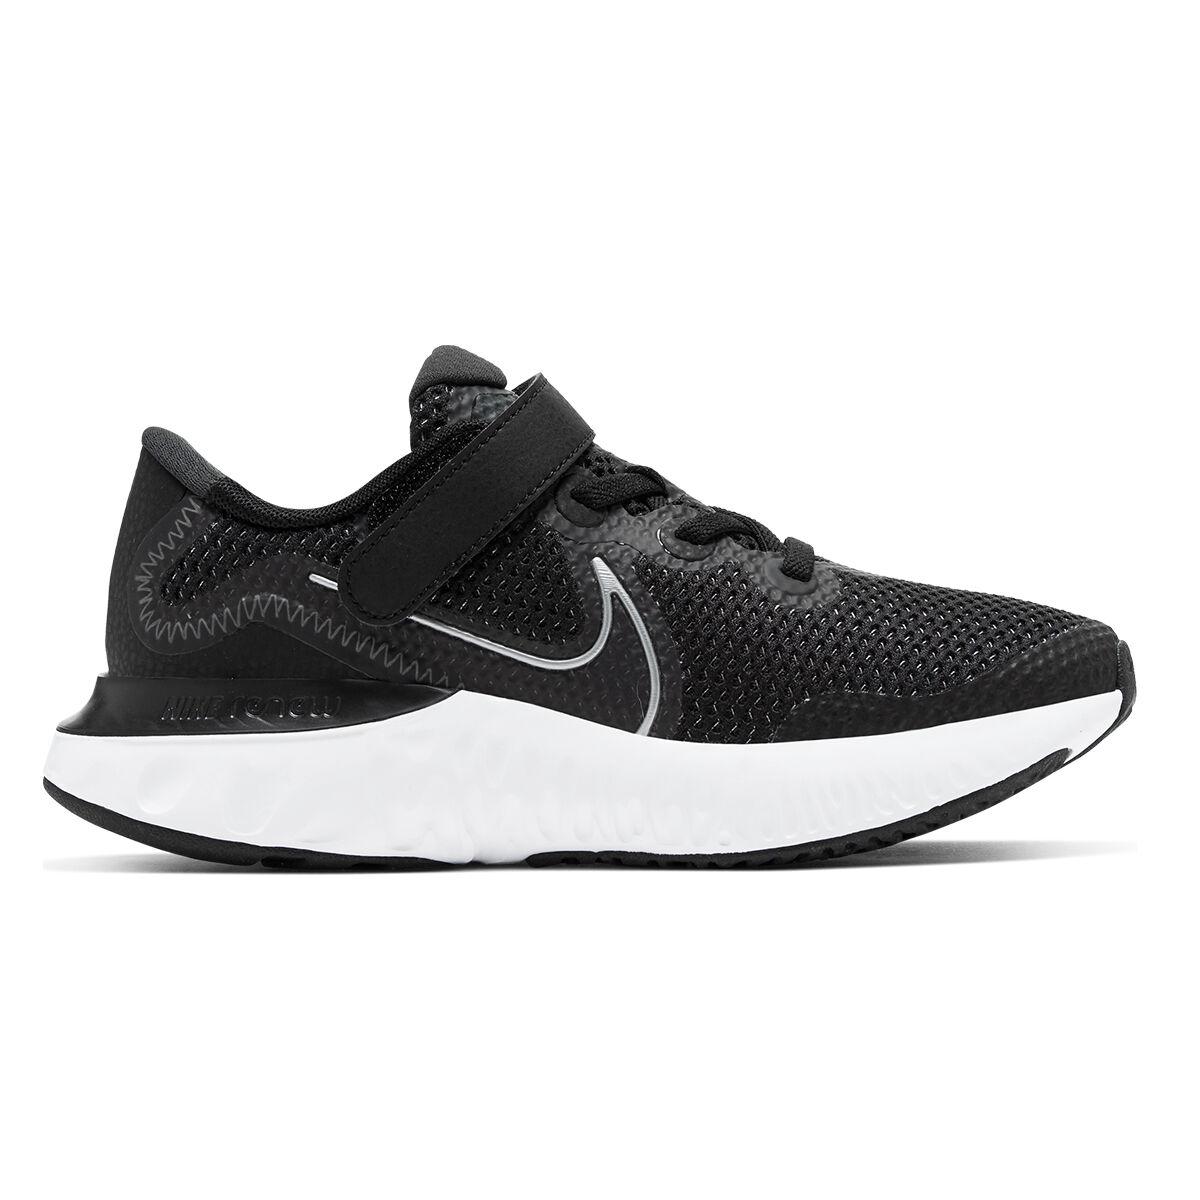 Nike Renew Run Kids Running Shoes